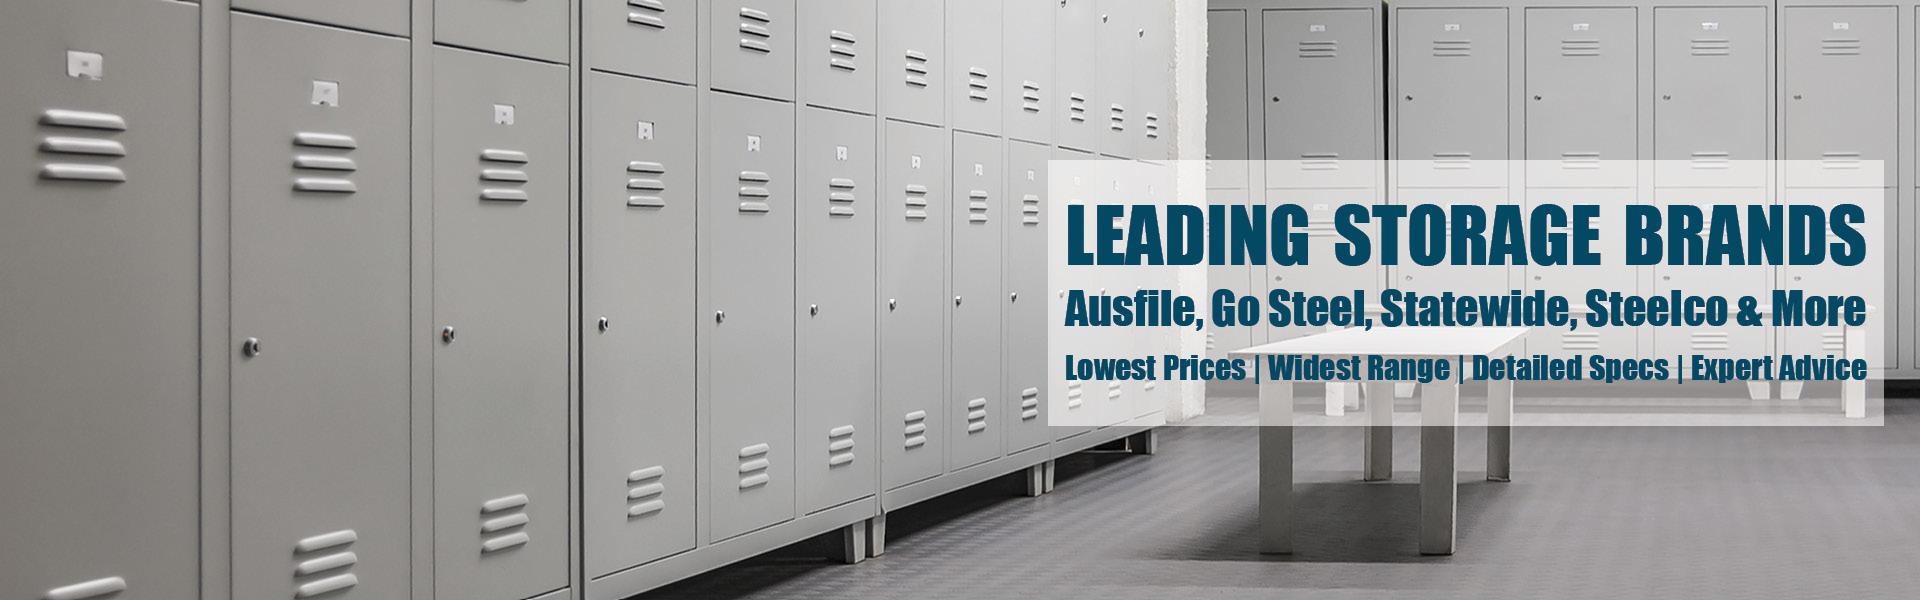 Leading Storage Brands